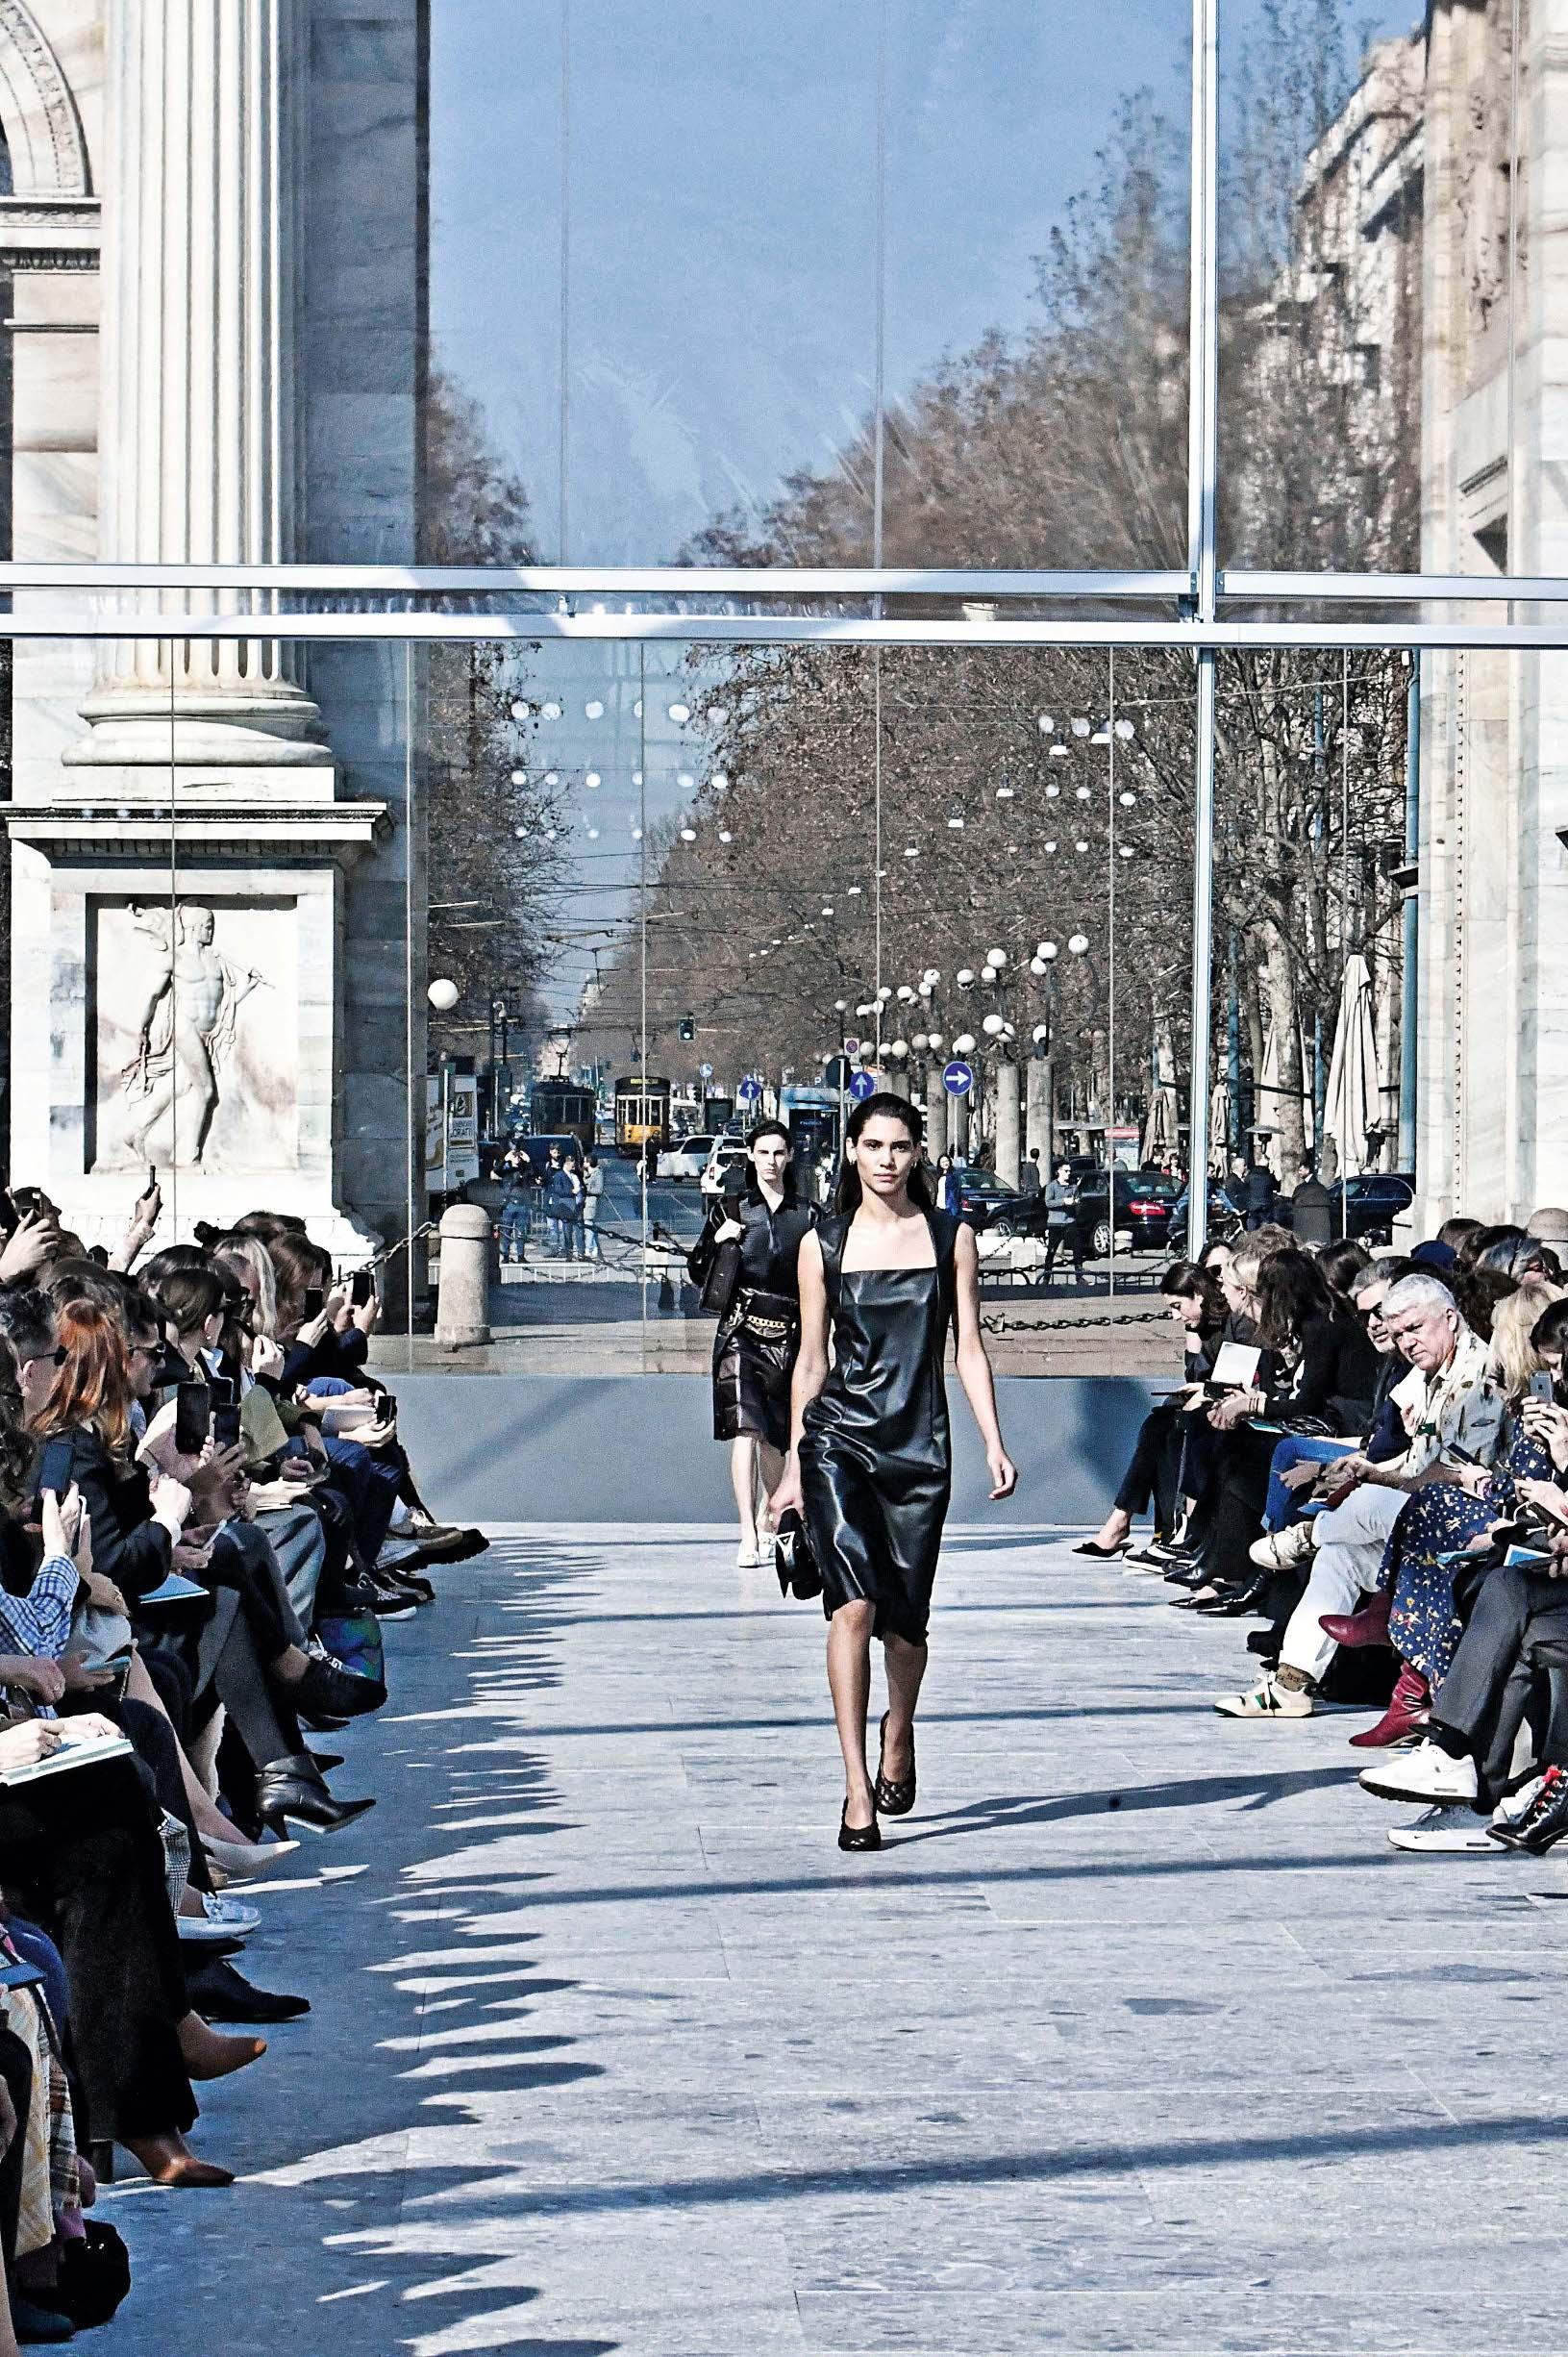 Bottega Veneta Milan Fashion Week RTW FW19/20 - Milan - February 22, 2019., Image: 415524648, License: Rights-managed, Restrictions: *** World Rights ***, Model Release: no, Credit line: Jonas Gustavsson / ddp USA / Profimedia